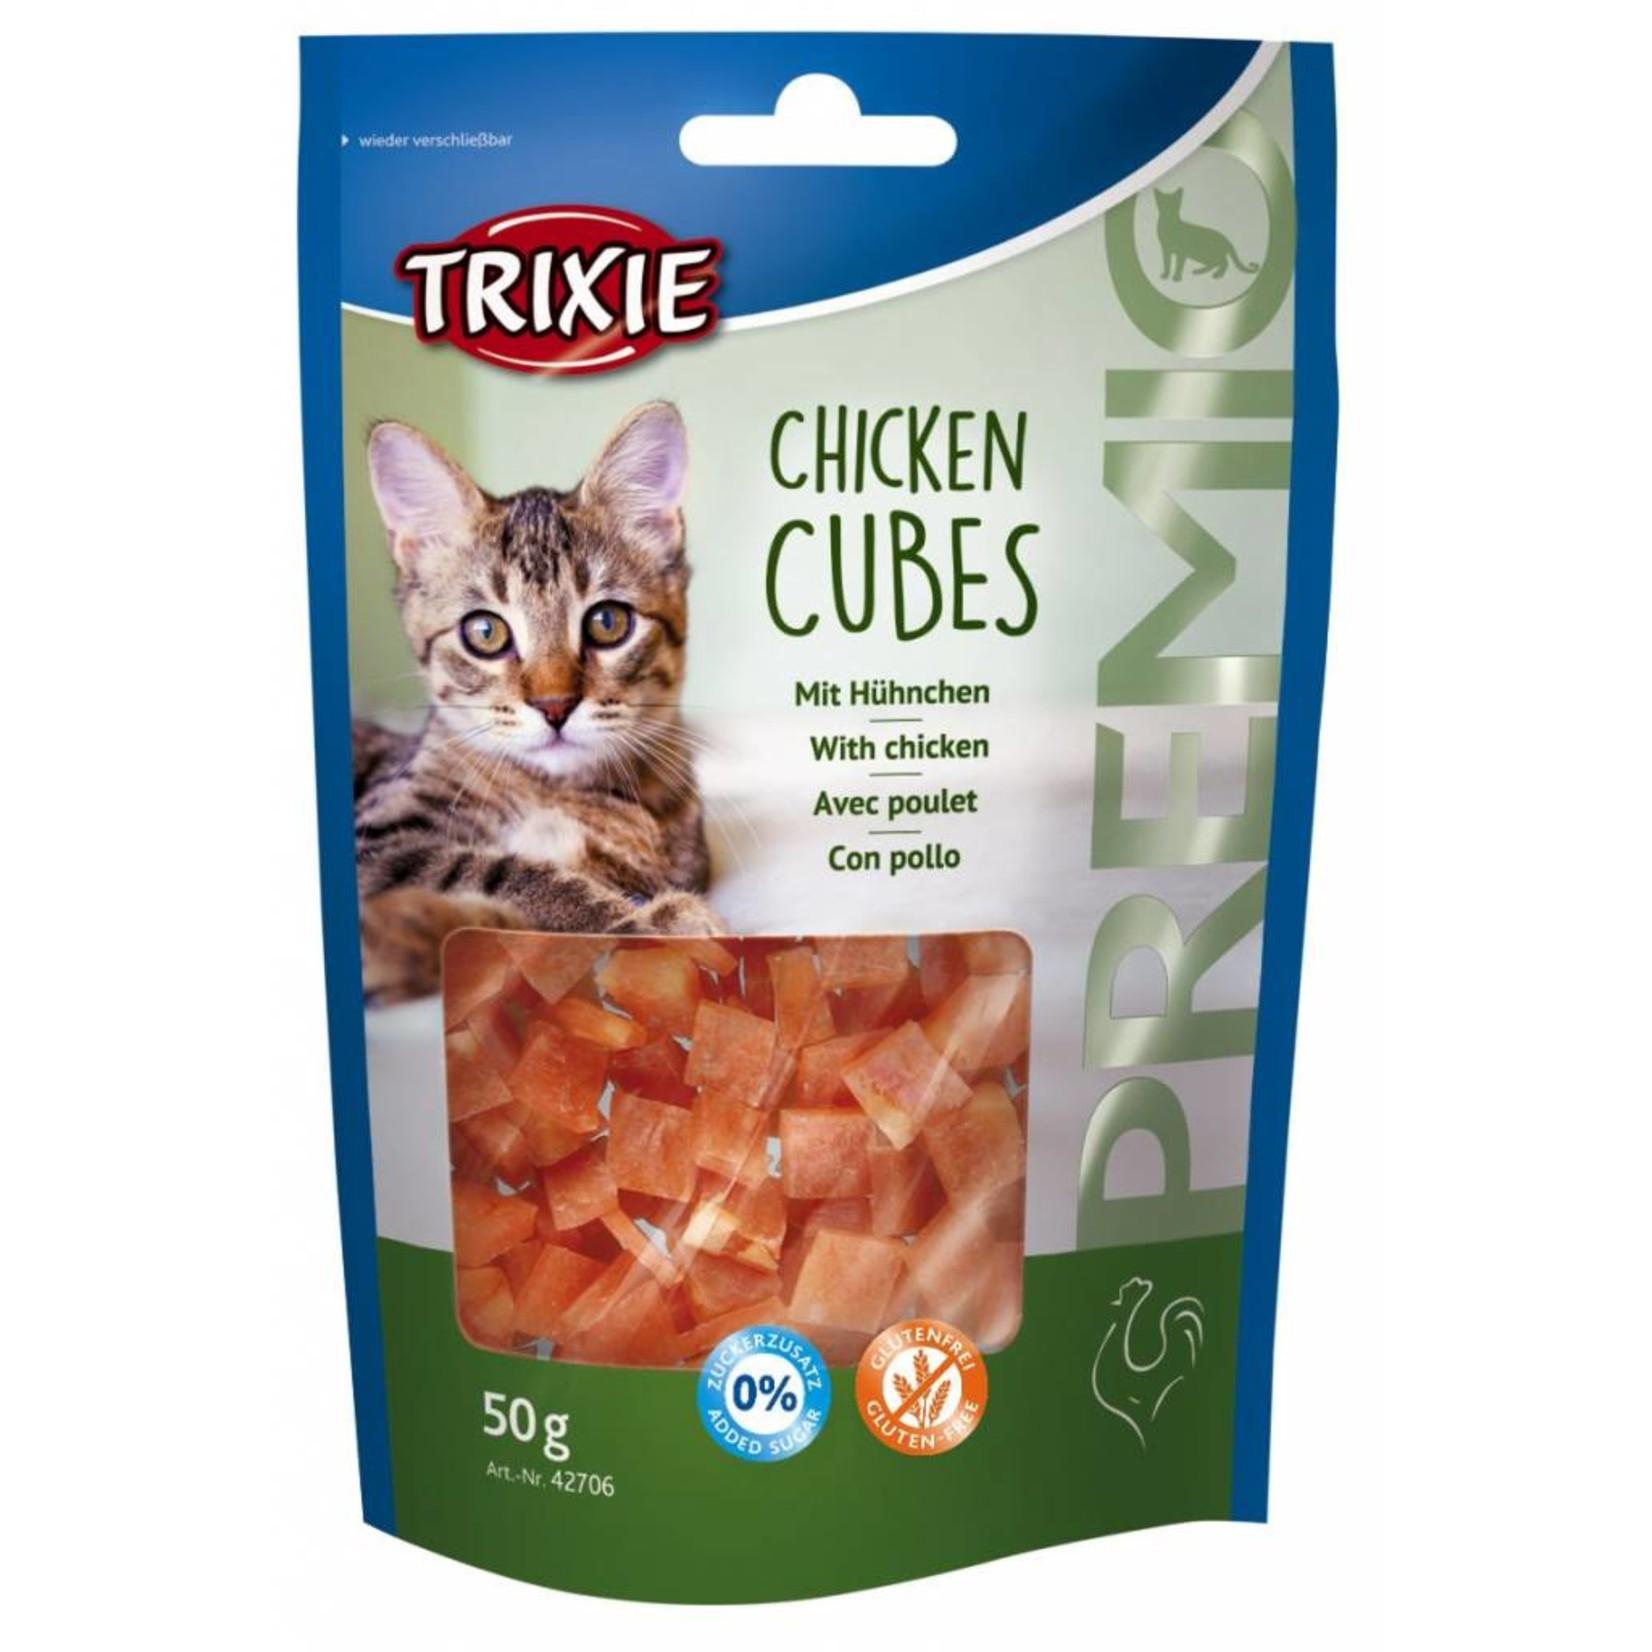 Trixie Chicken Cubes Cat Treats, 50g